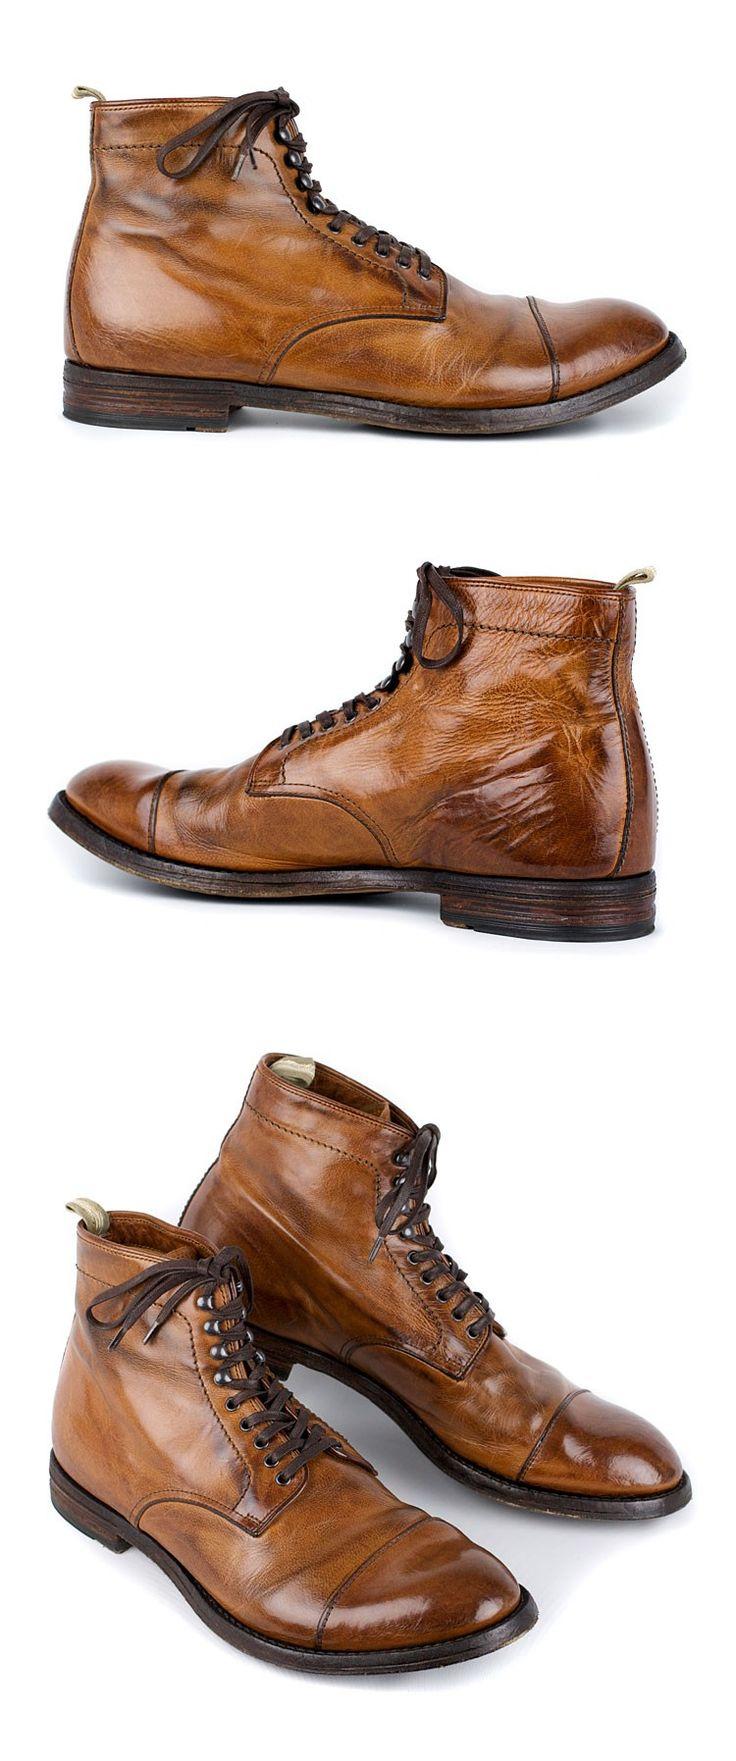 Officine Creative Anatomia 16 Men's Lace-up Boot - Cognac   resoul.com